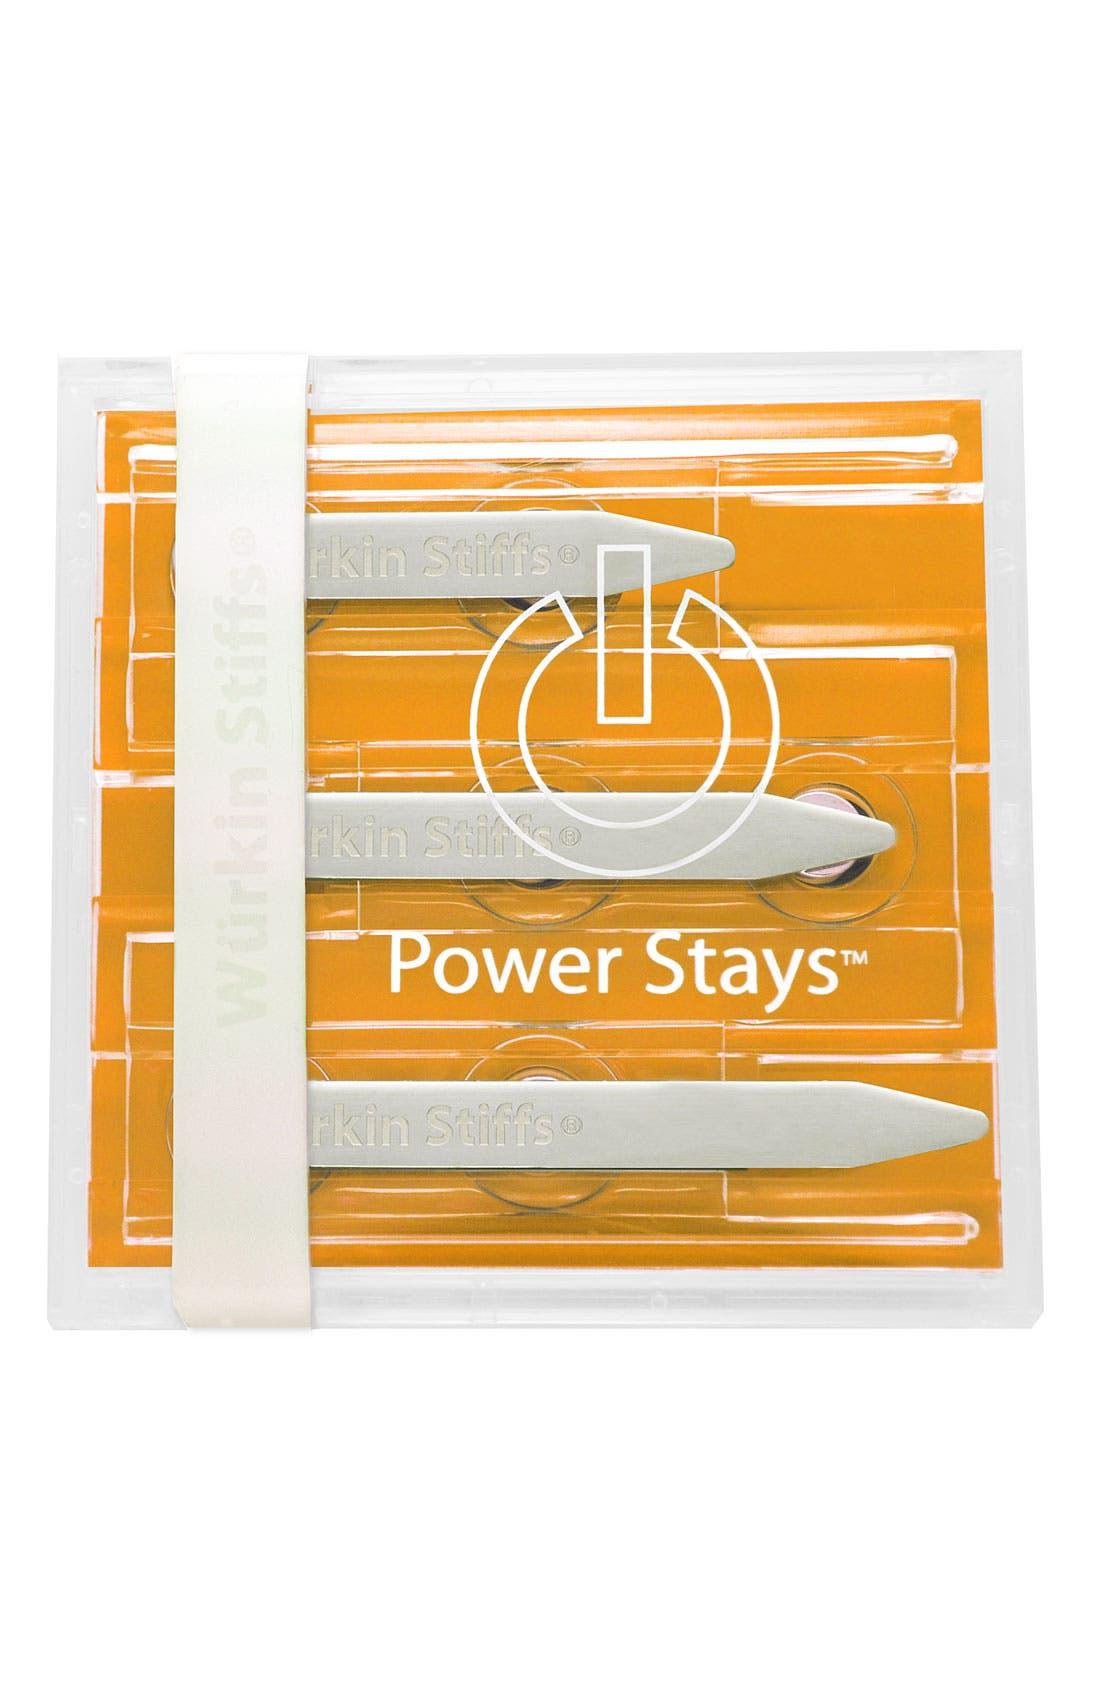 Alternate Image 1 Selected - Würkin Stiffs 'Power' Stays (6-Piece Set)